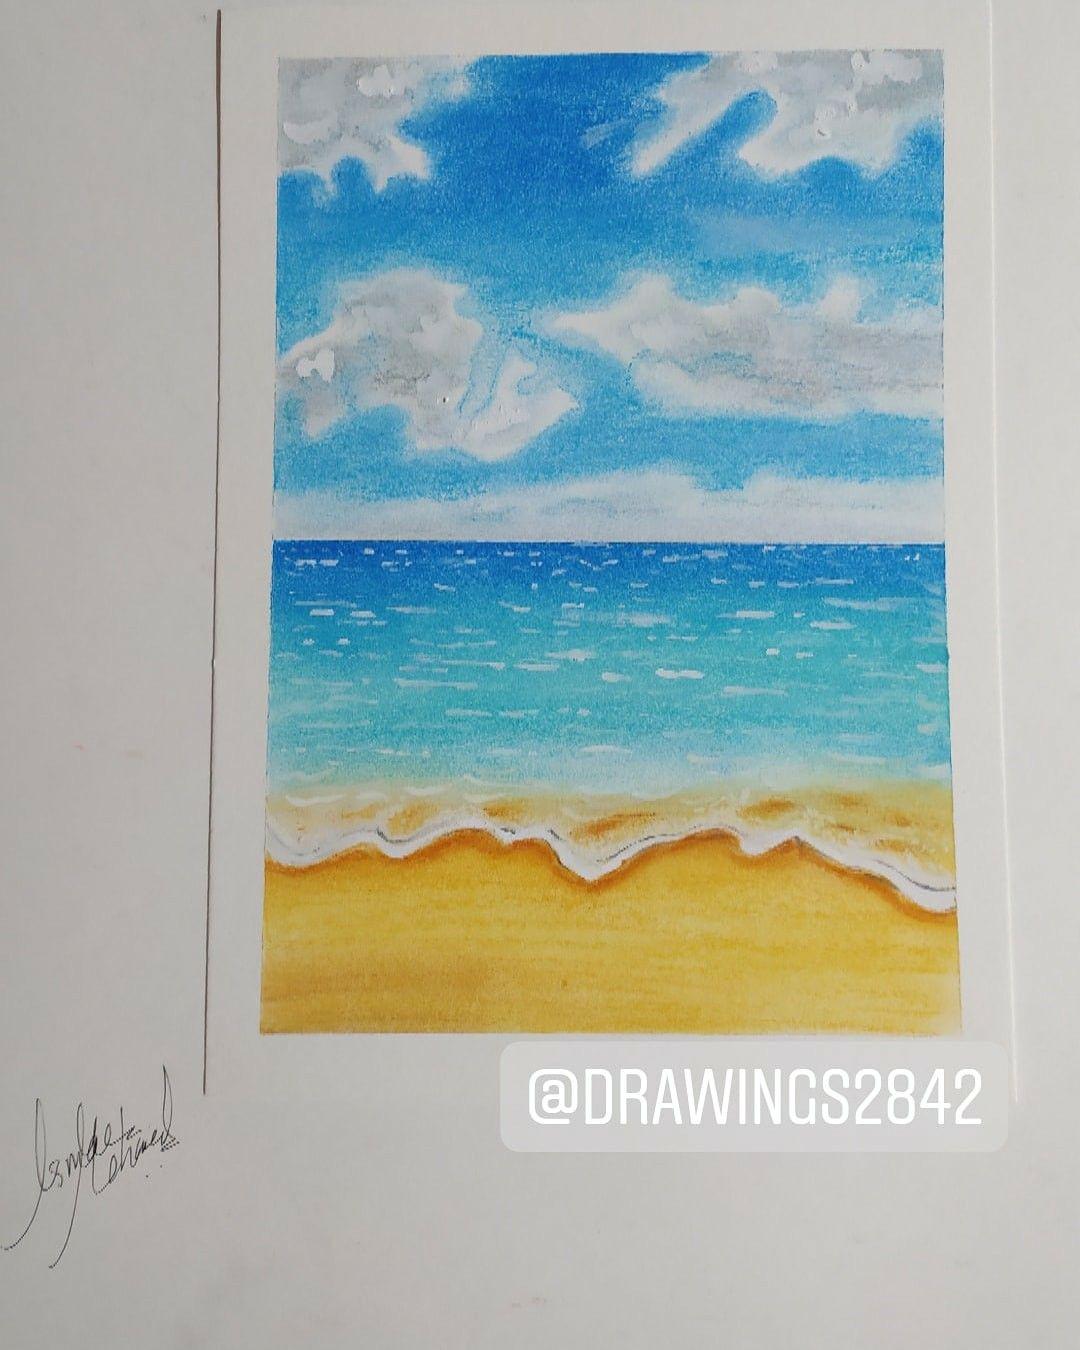 A Landscape Of The Sea Using Soft Pastel Colors منظر طبيعي للبحر مرسوم بالوان السوفت باستيل Painting Soft Pastel Pastel Colors